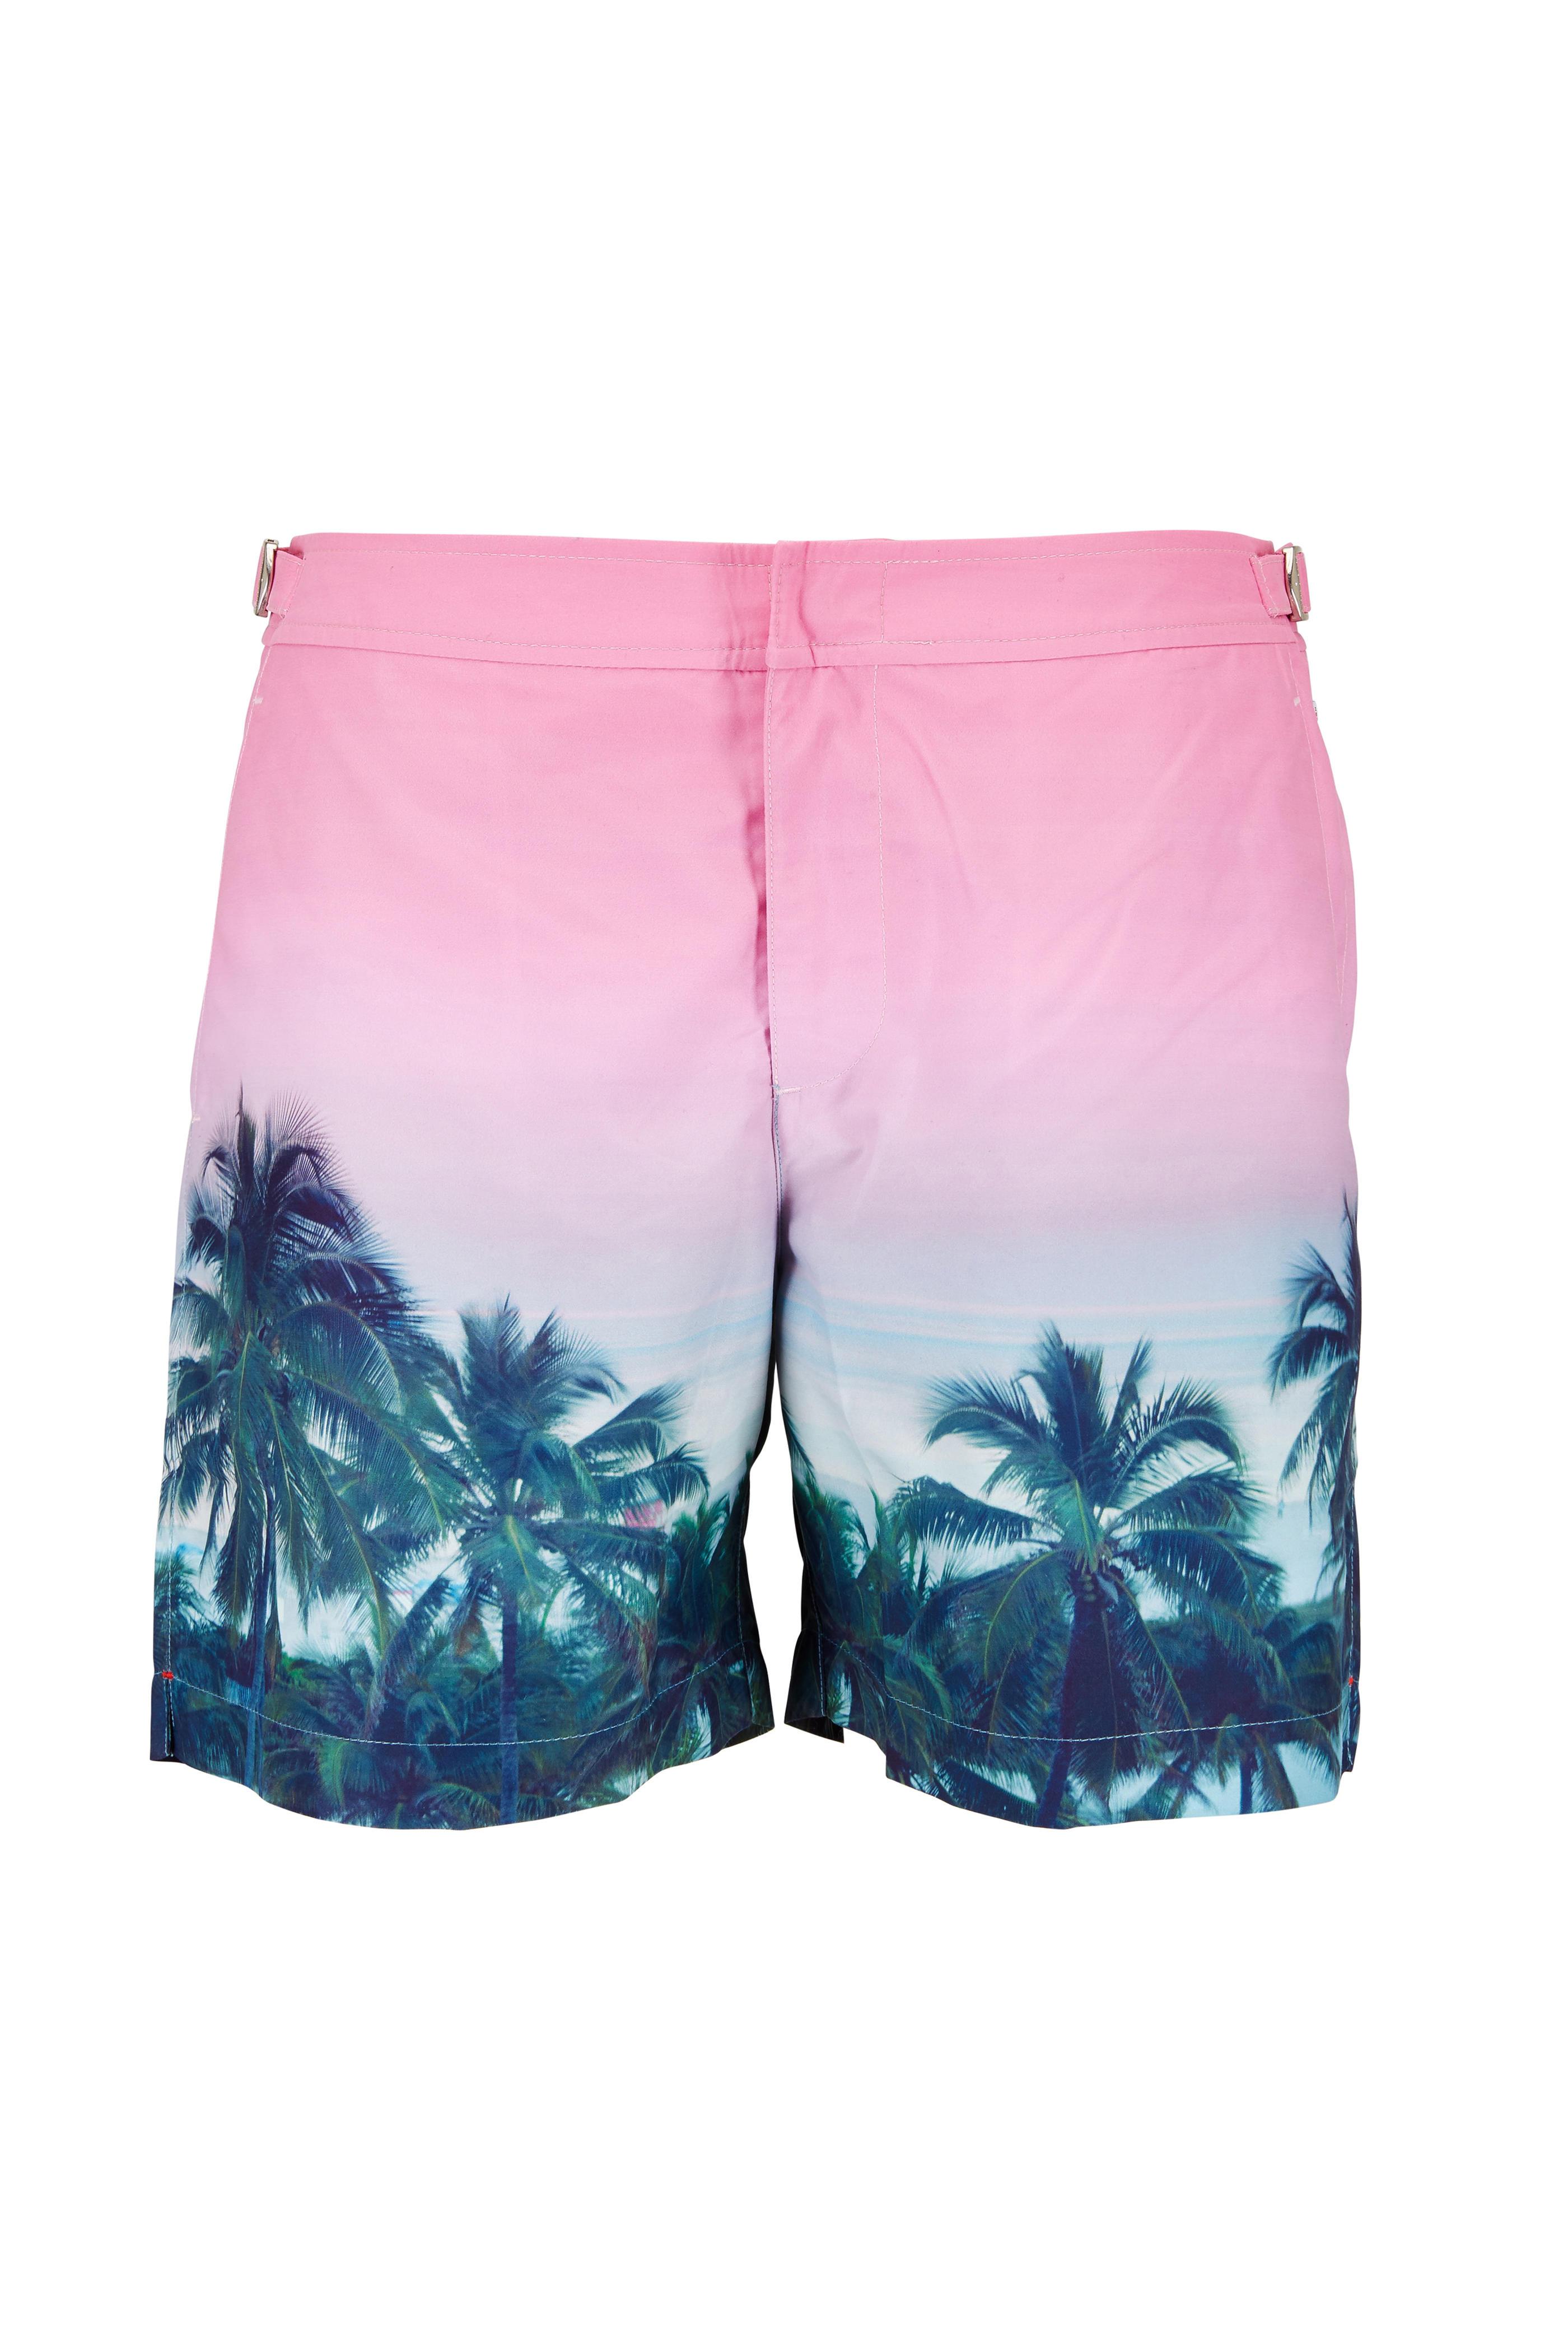 99feae98941 Orlebar Brown - Bulldog Pink Palms Aplenty Swim Trunks | Mitchell Stores